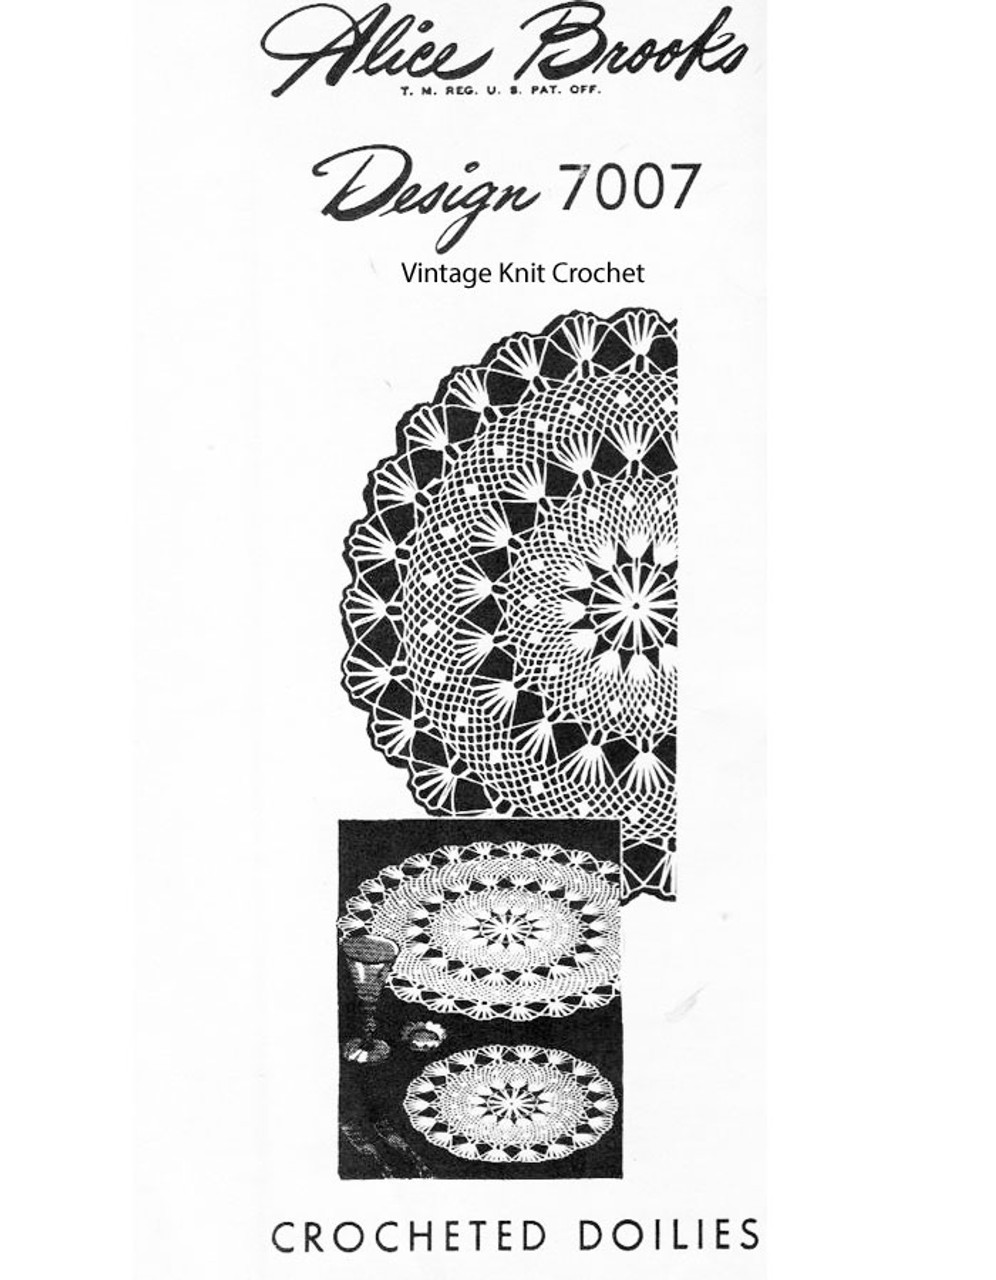 Crochet Chain Loop Doily pattern Design 7007